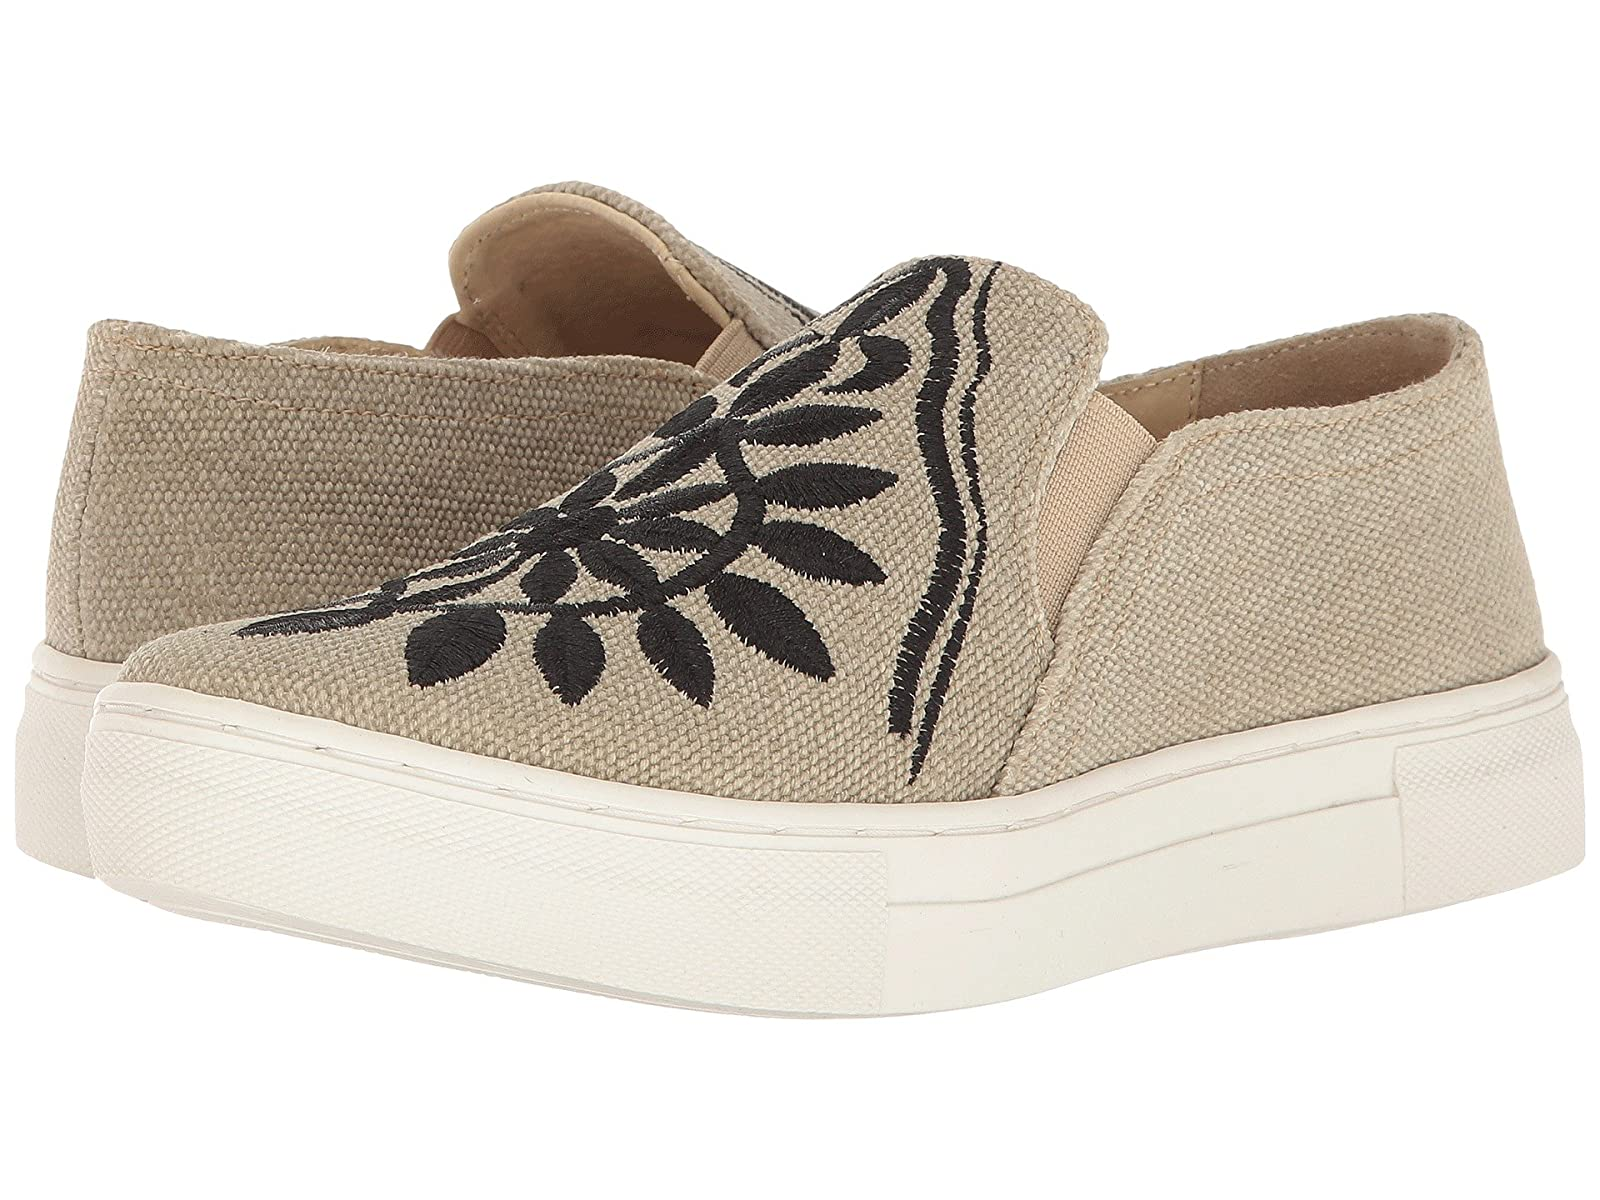 Seychelles SunshineCheap and distinctive eye-catching shoes